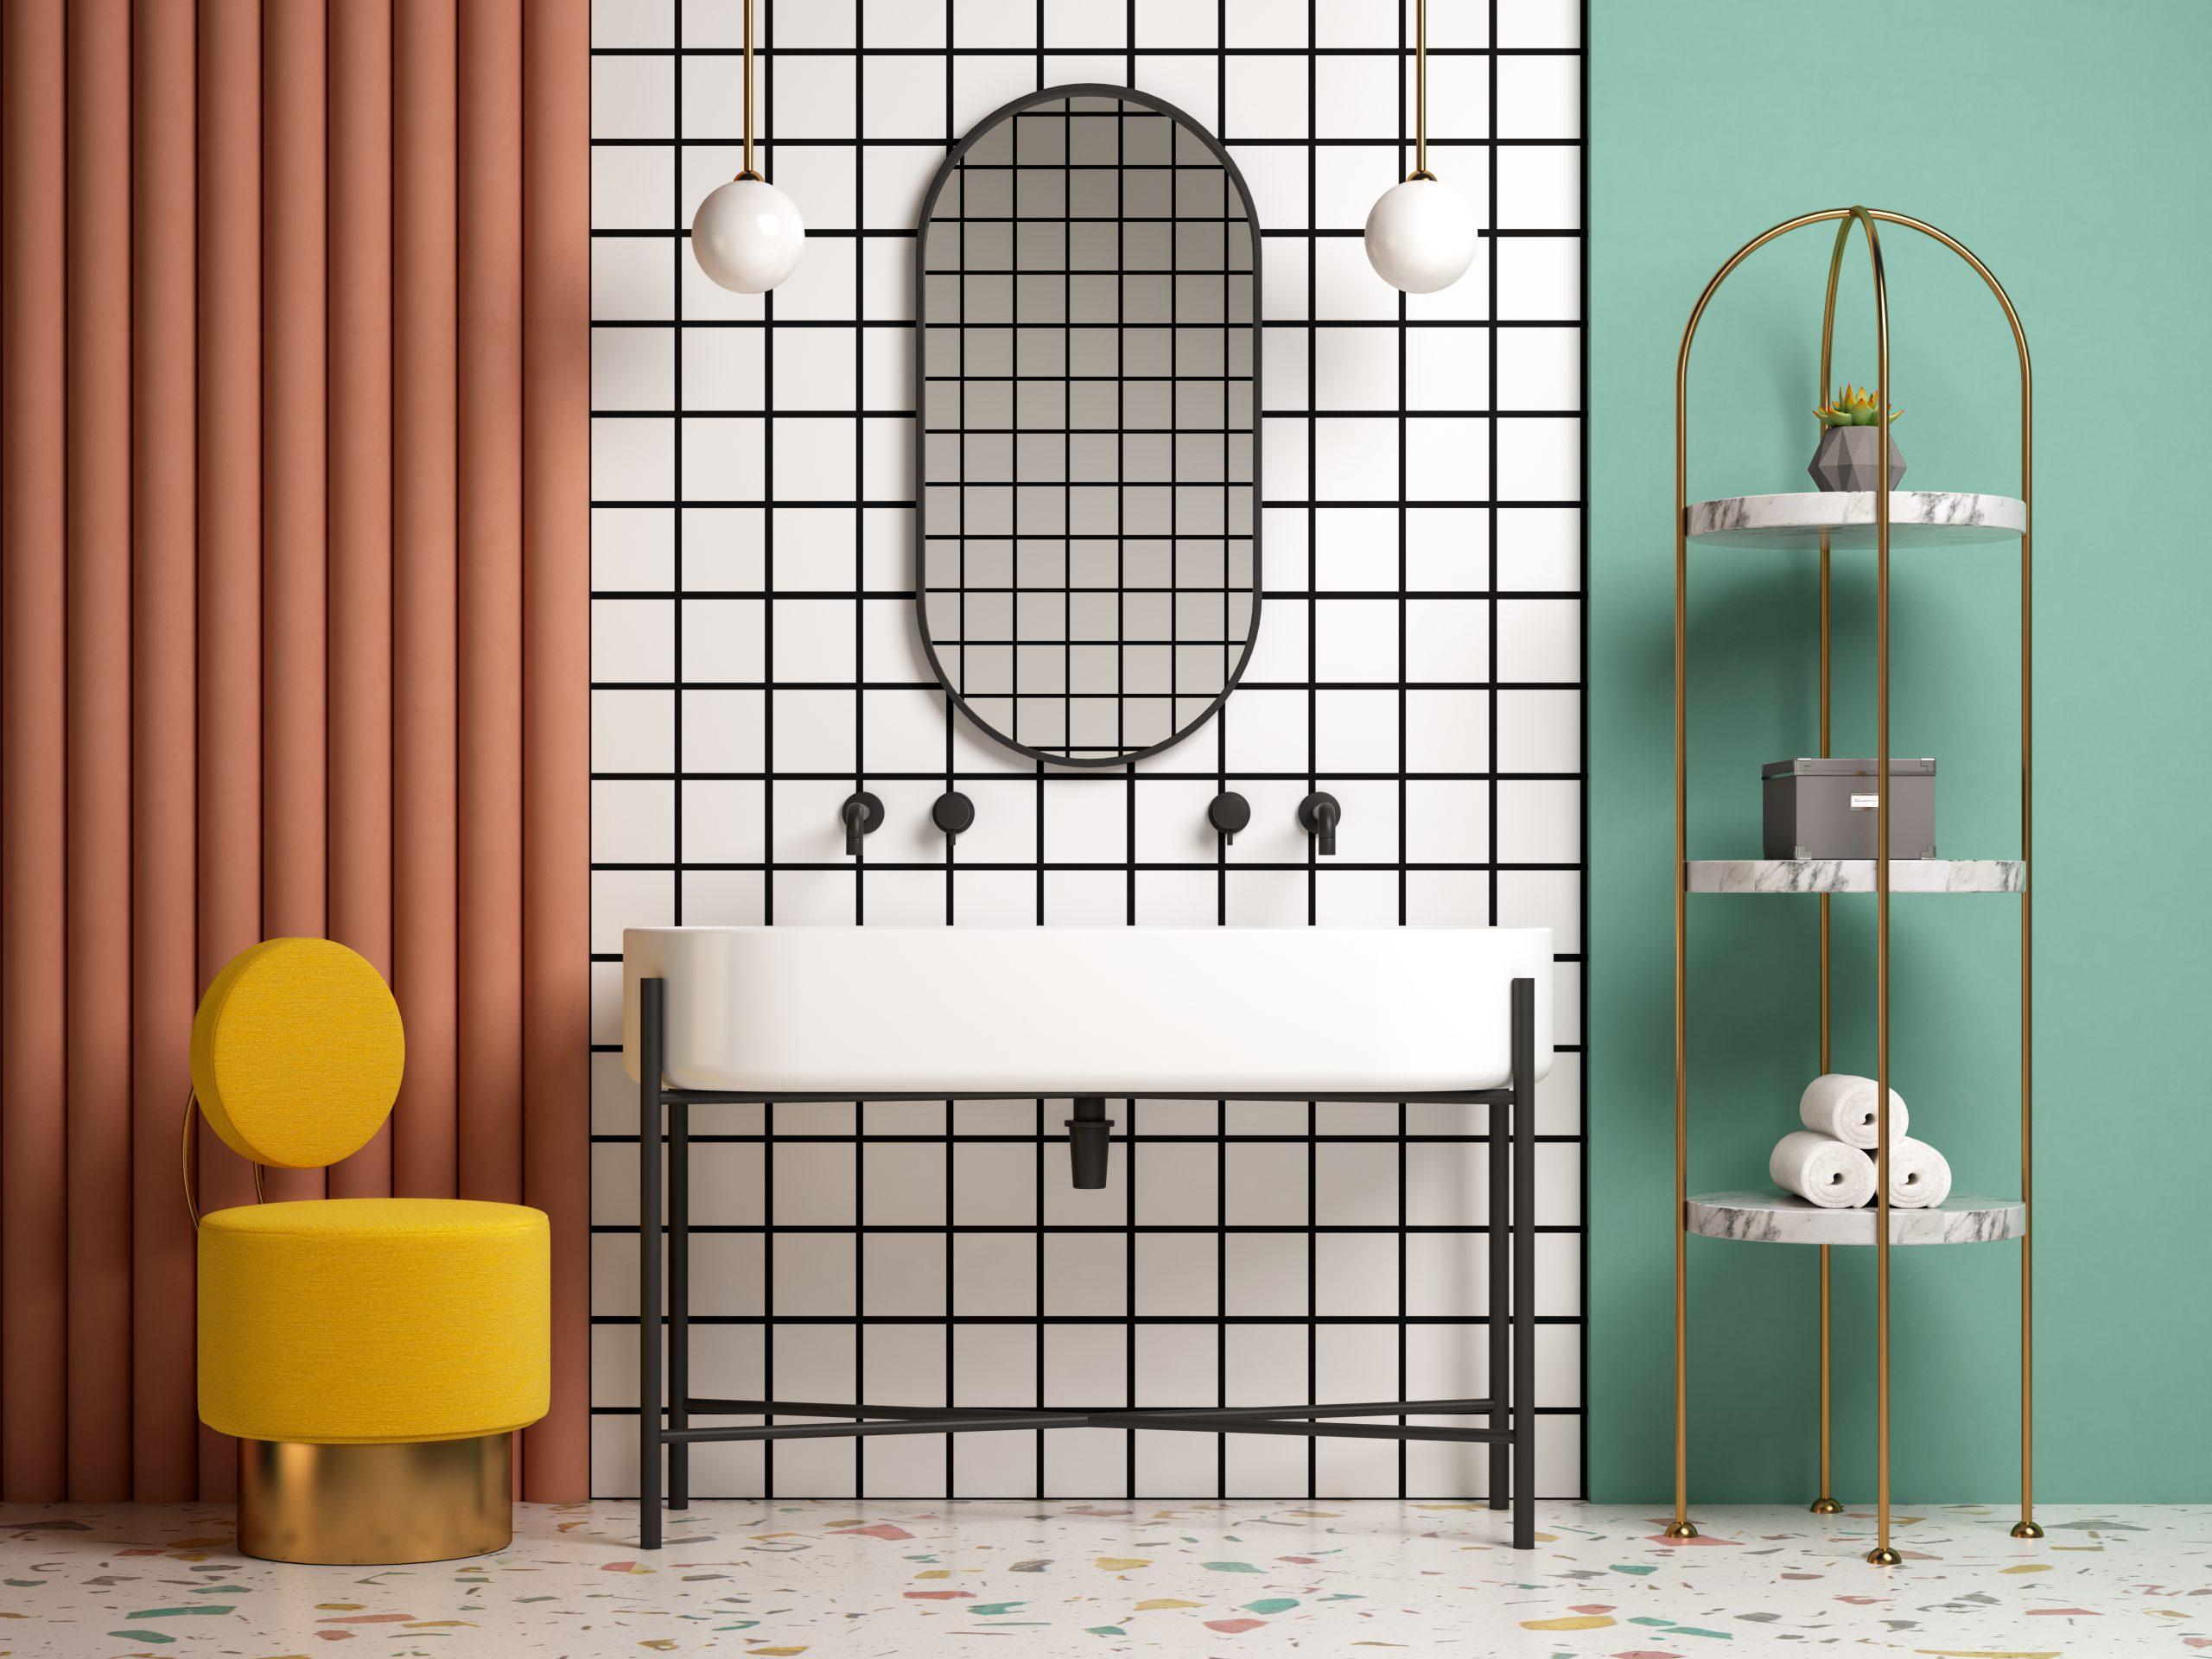 baño con colores arriesgados